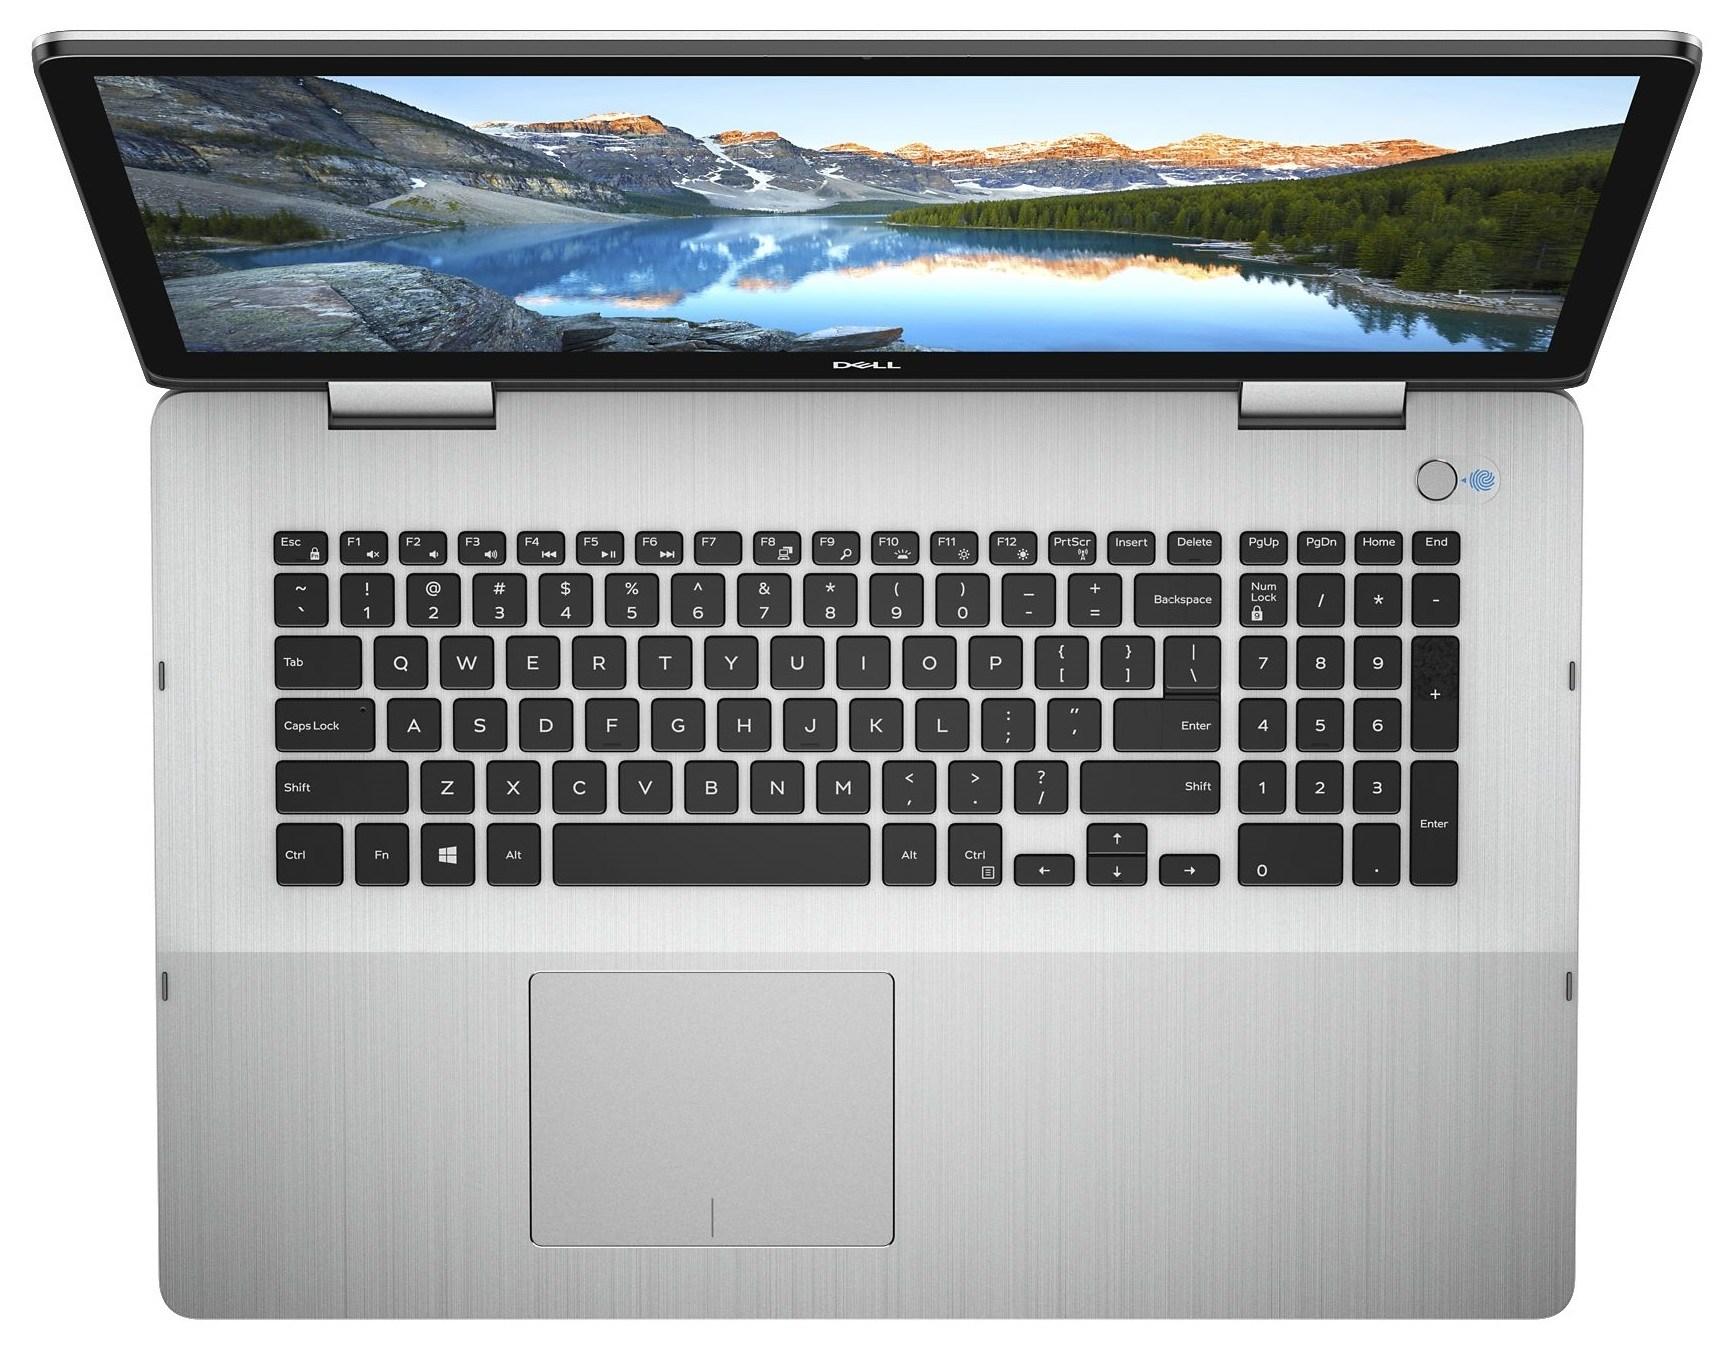 Notebook Dell Inspiron 7786 17.3 Full HD Touch Intel Core i7-8565U MX150-2GB RAM 16GB SSD 512GB Windows 10 Home